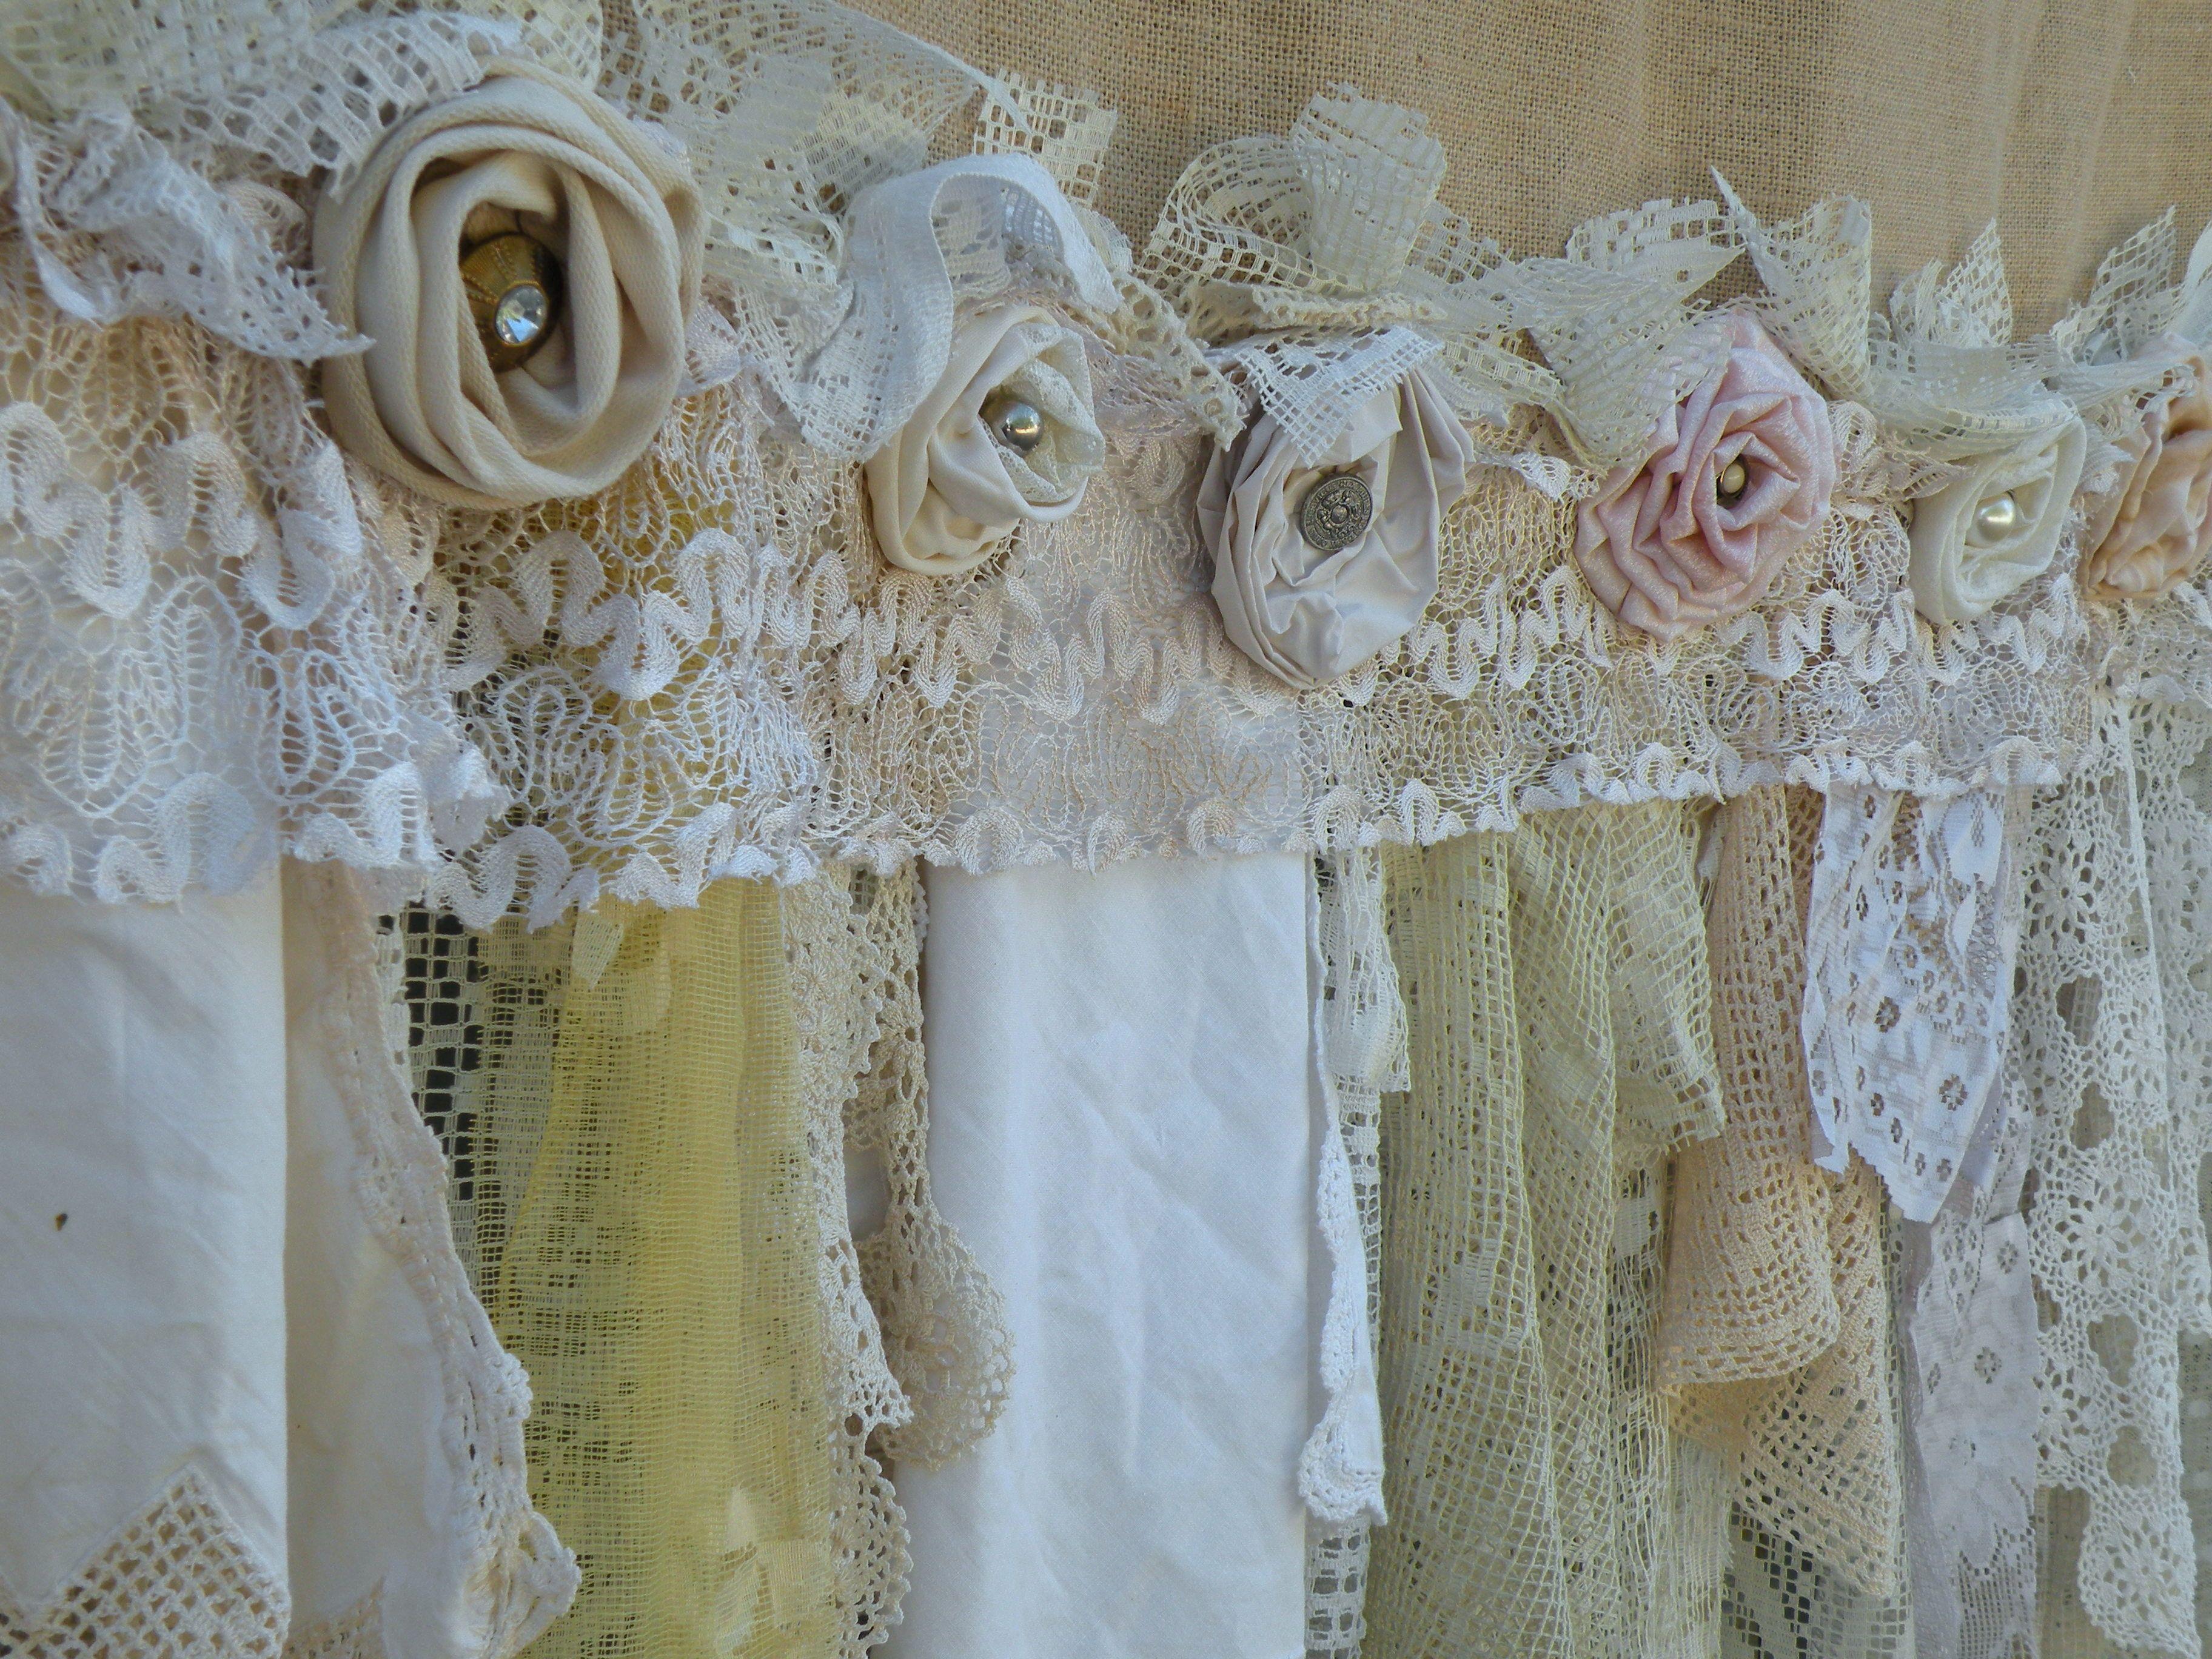 Burlap Vintage Lace Curtains Drapes Panel Boho Made To Order Etsy Vintage Lace Curtains Shabby Chic Panels Rustic Shabby Chic Decor